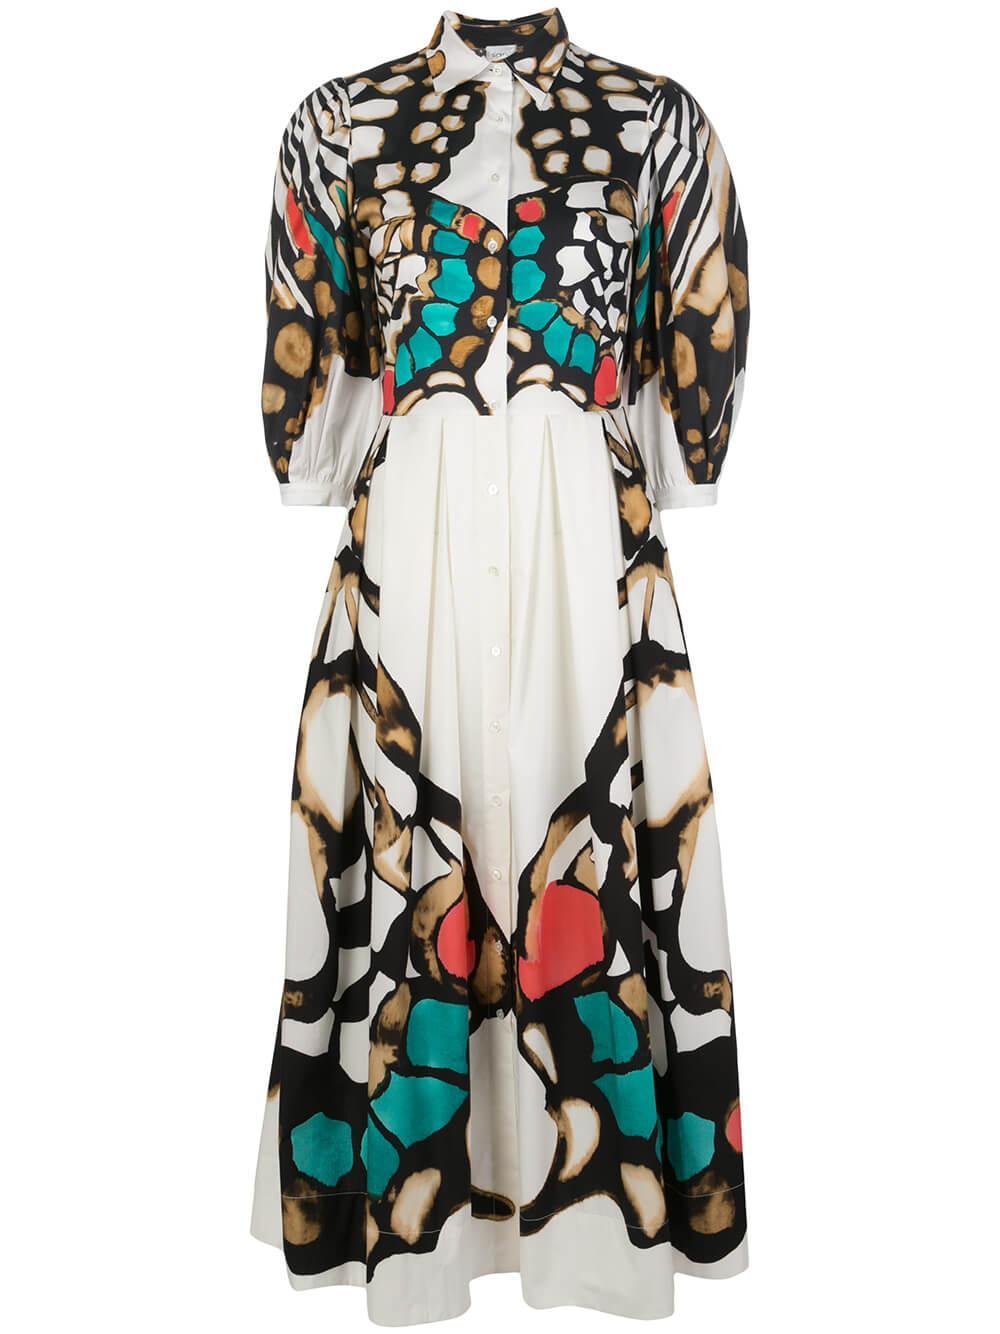 3/4 Sleeve Butterfly Print Maxi Dress